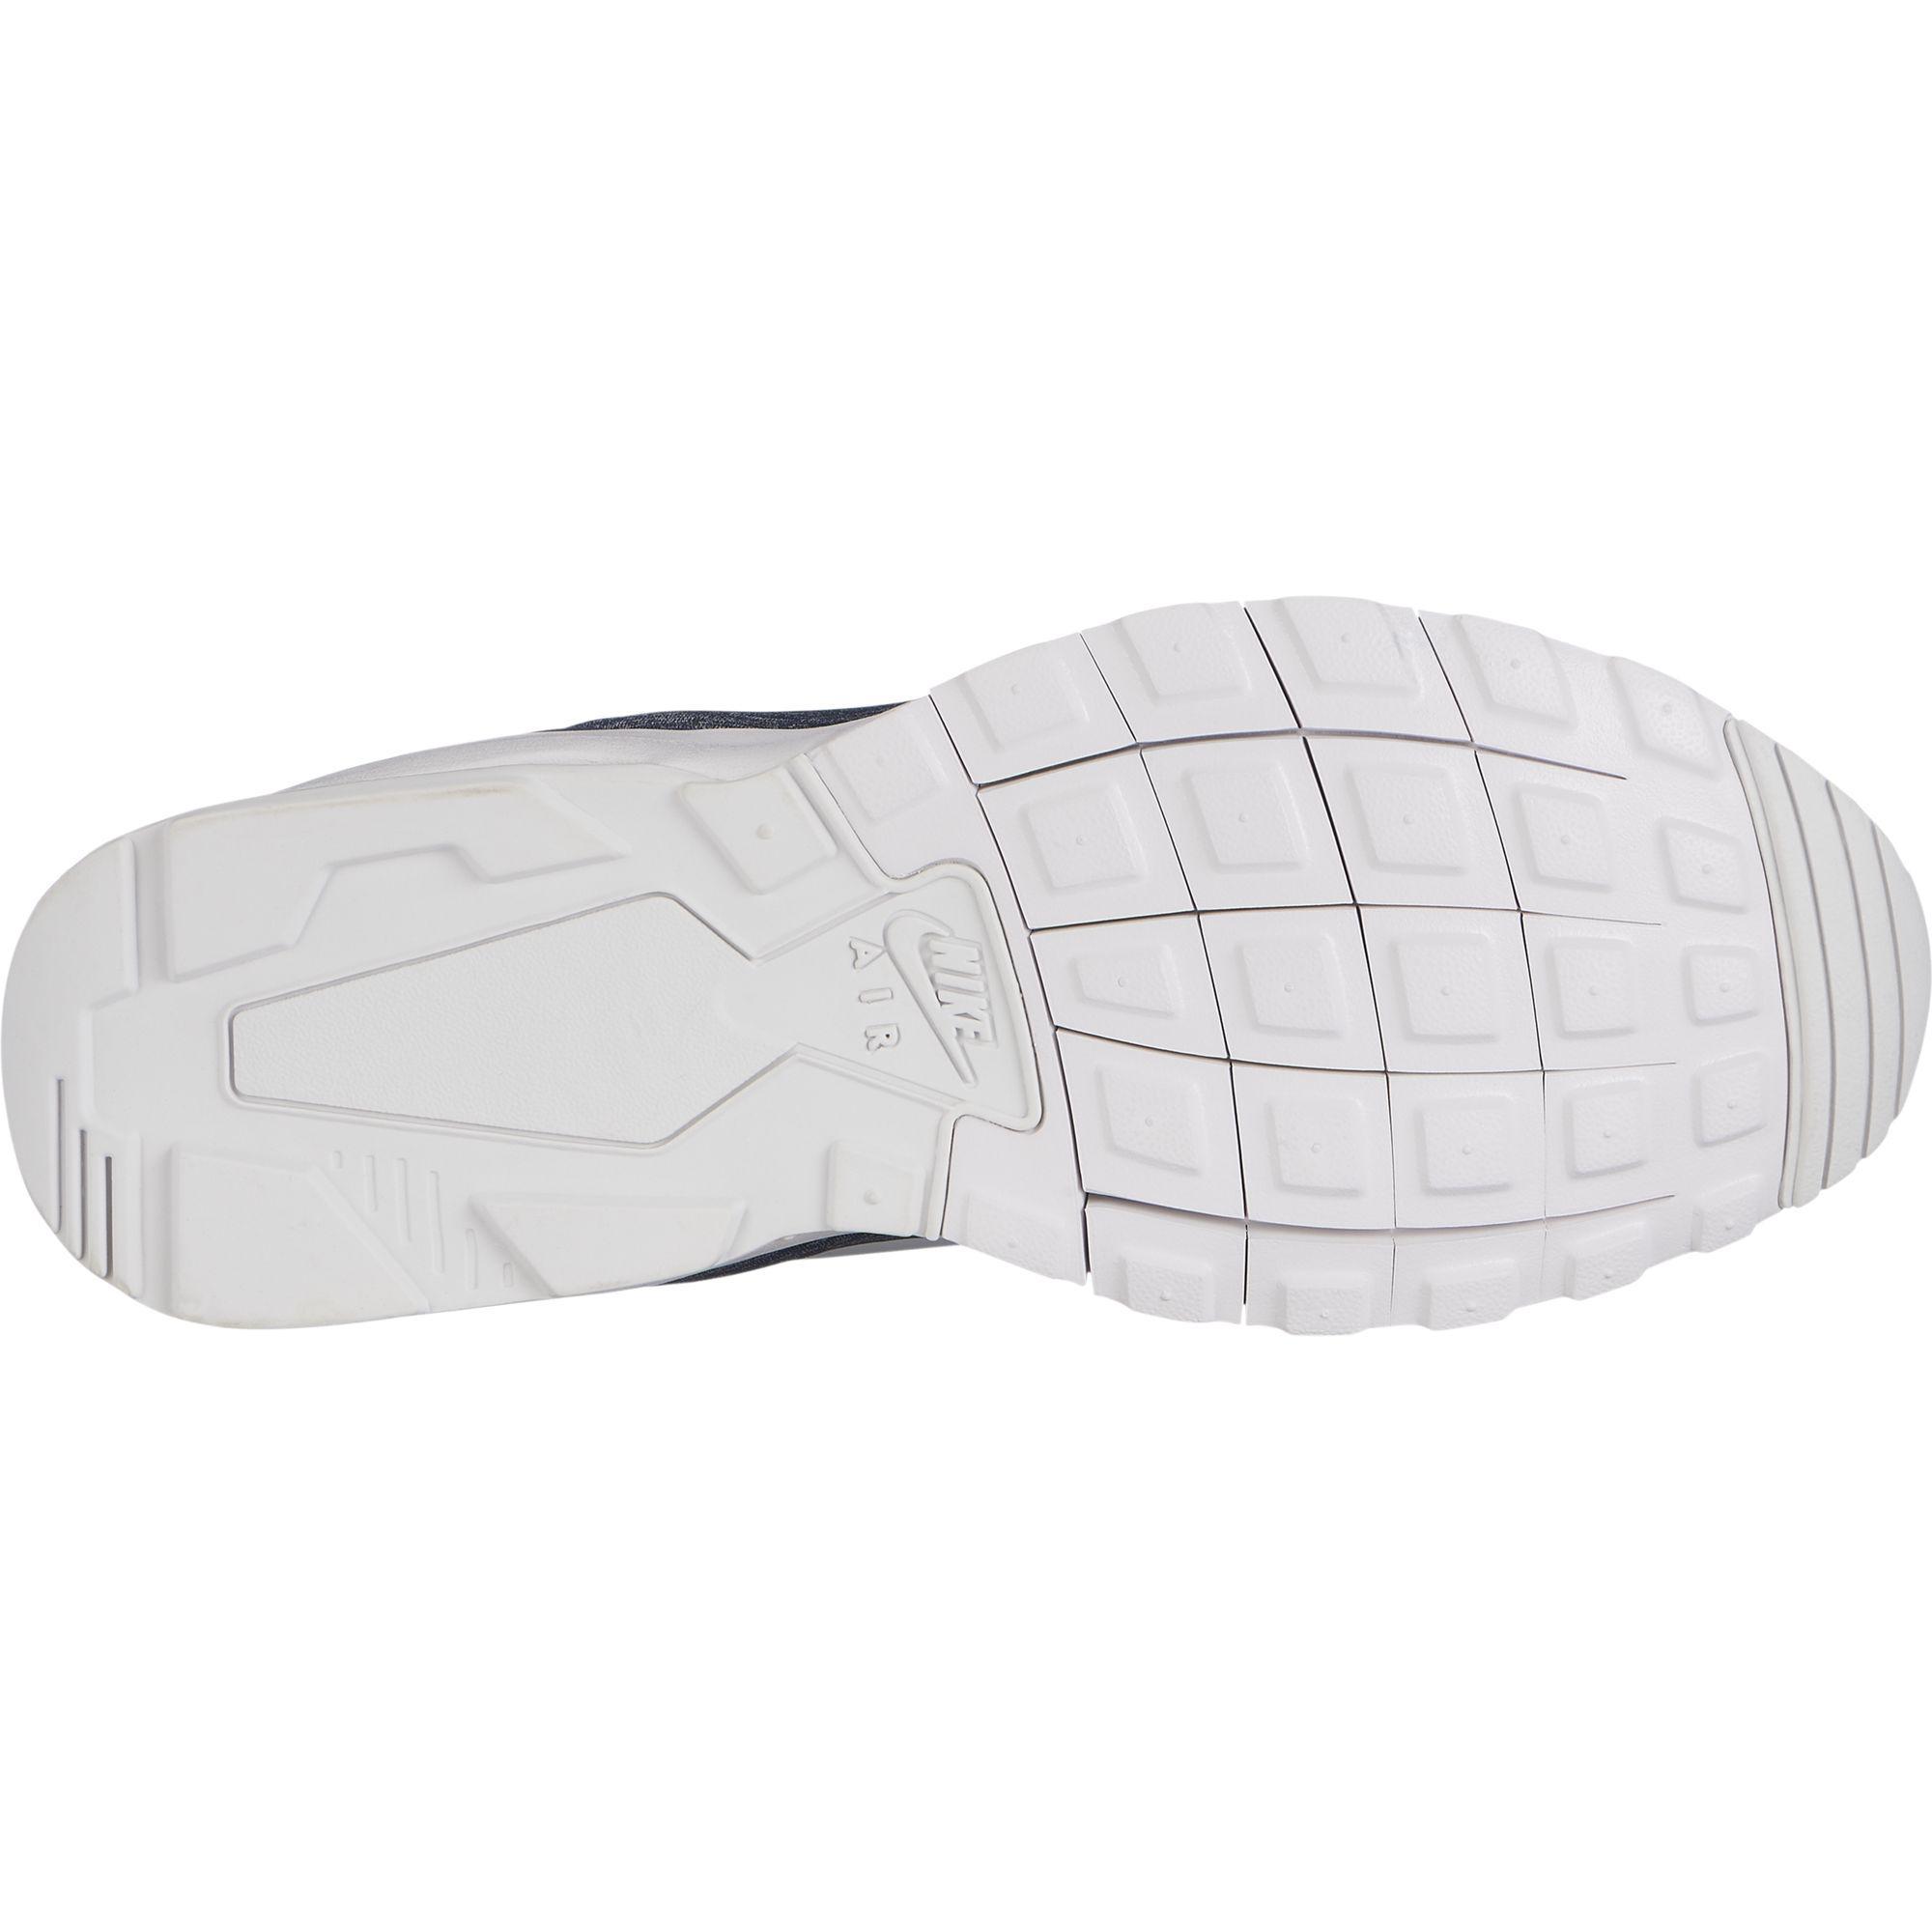 c8b9534107 Nike Mens Air Max Motion Running Shoes - Thunder Blue/Vast Grey/Hot Punch